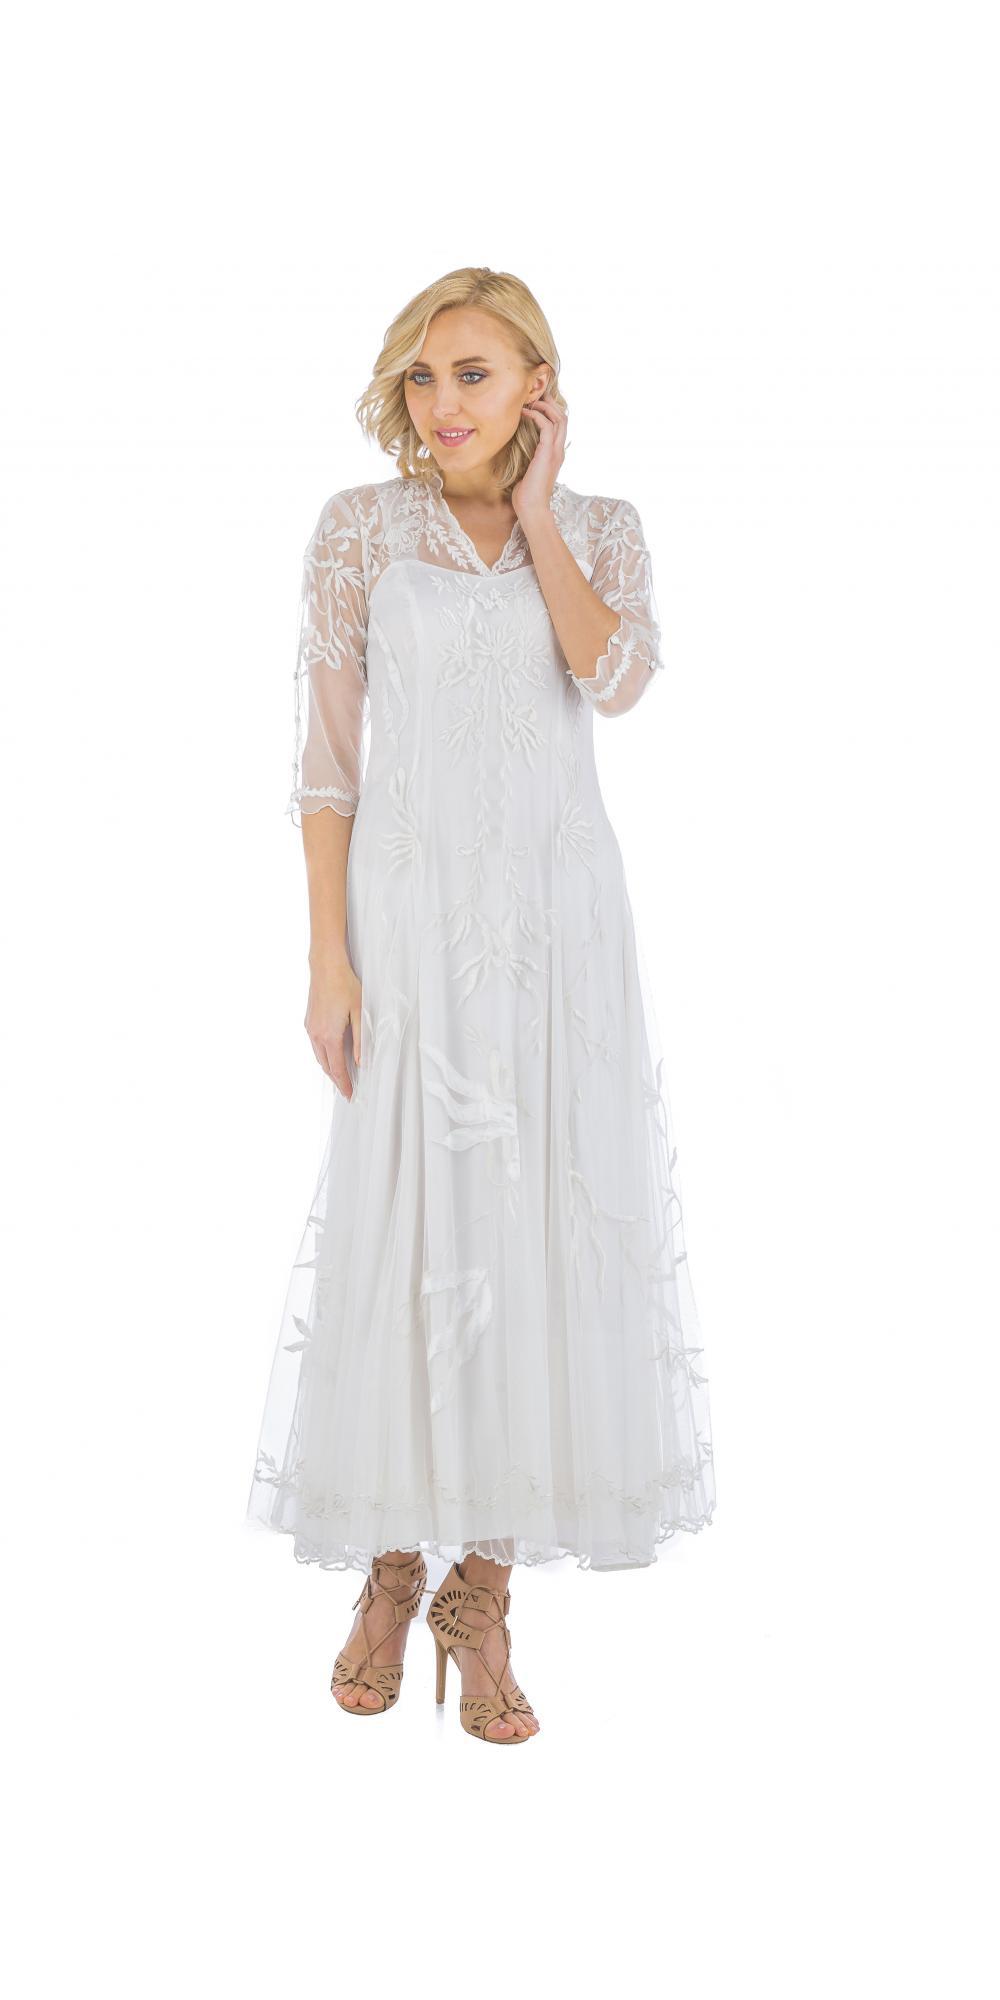 True Romance Nataya CL-2149 Vintage Style Wedding Dress in Ivory